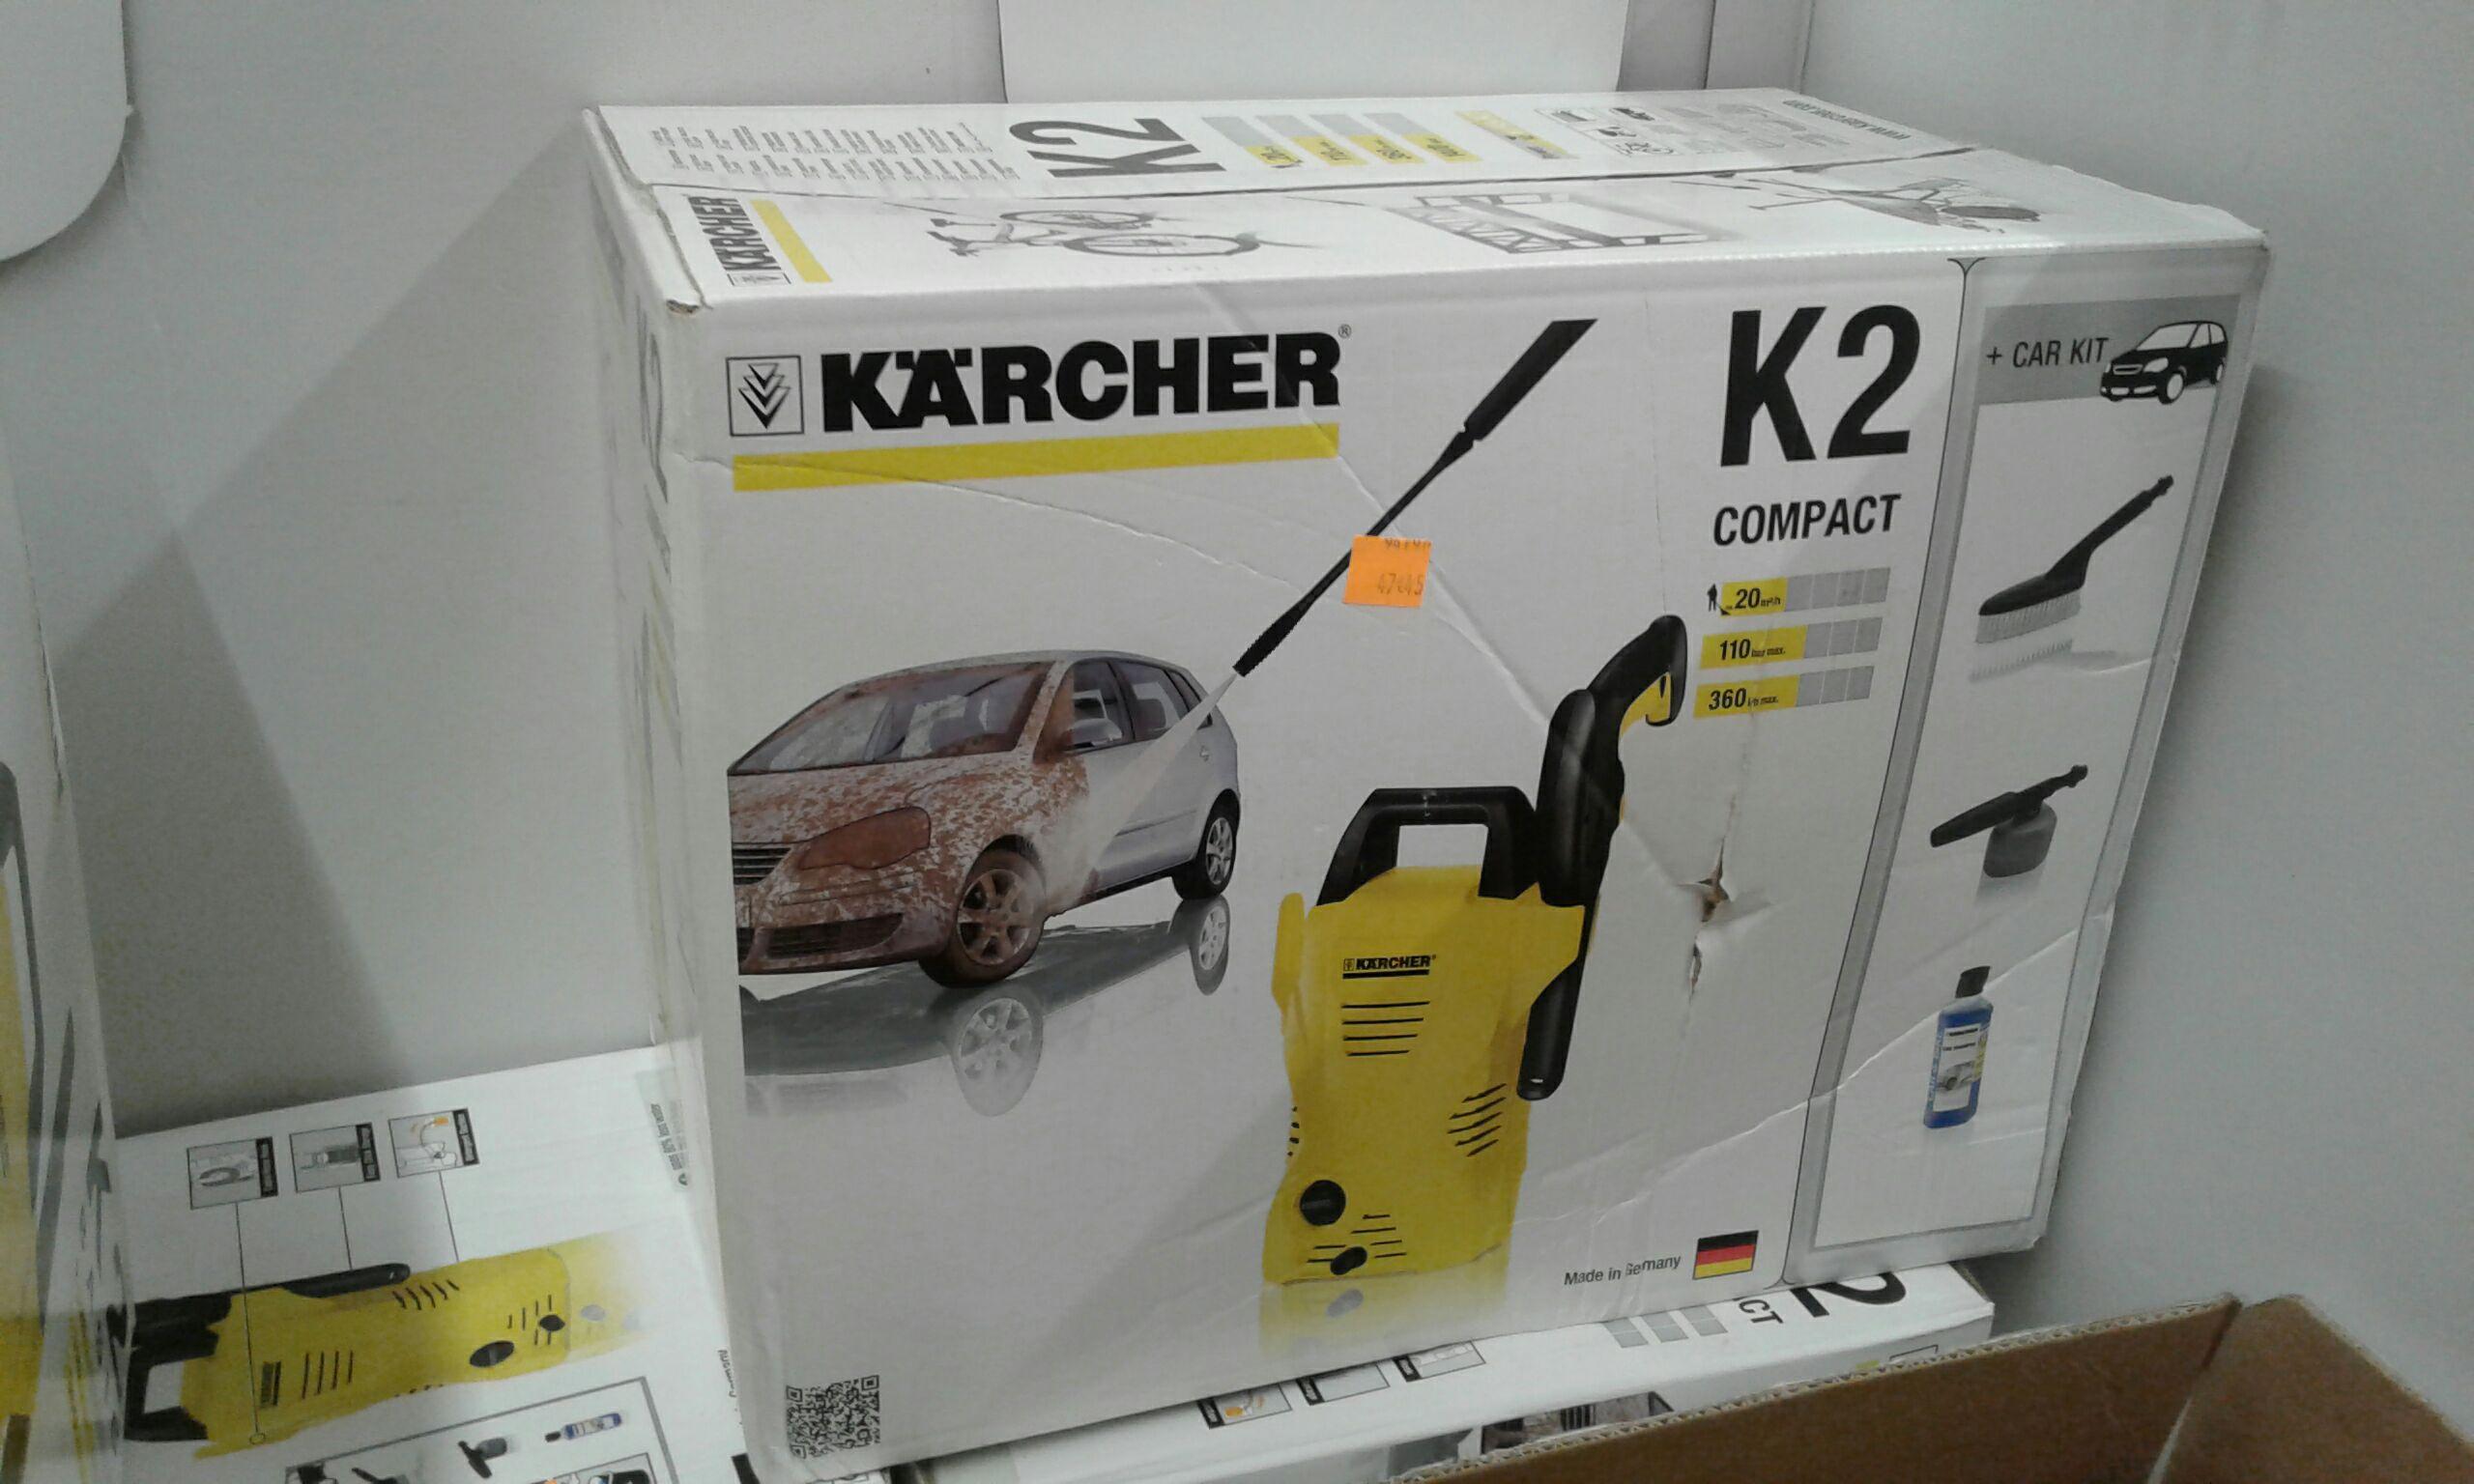 Karcher K2 compact avec kit voiture - Athis mons (91)